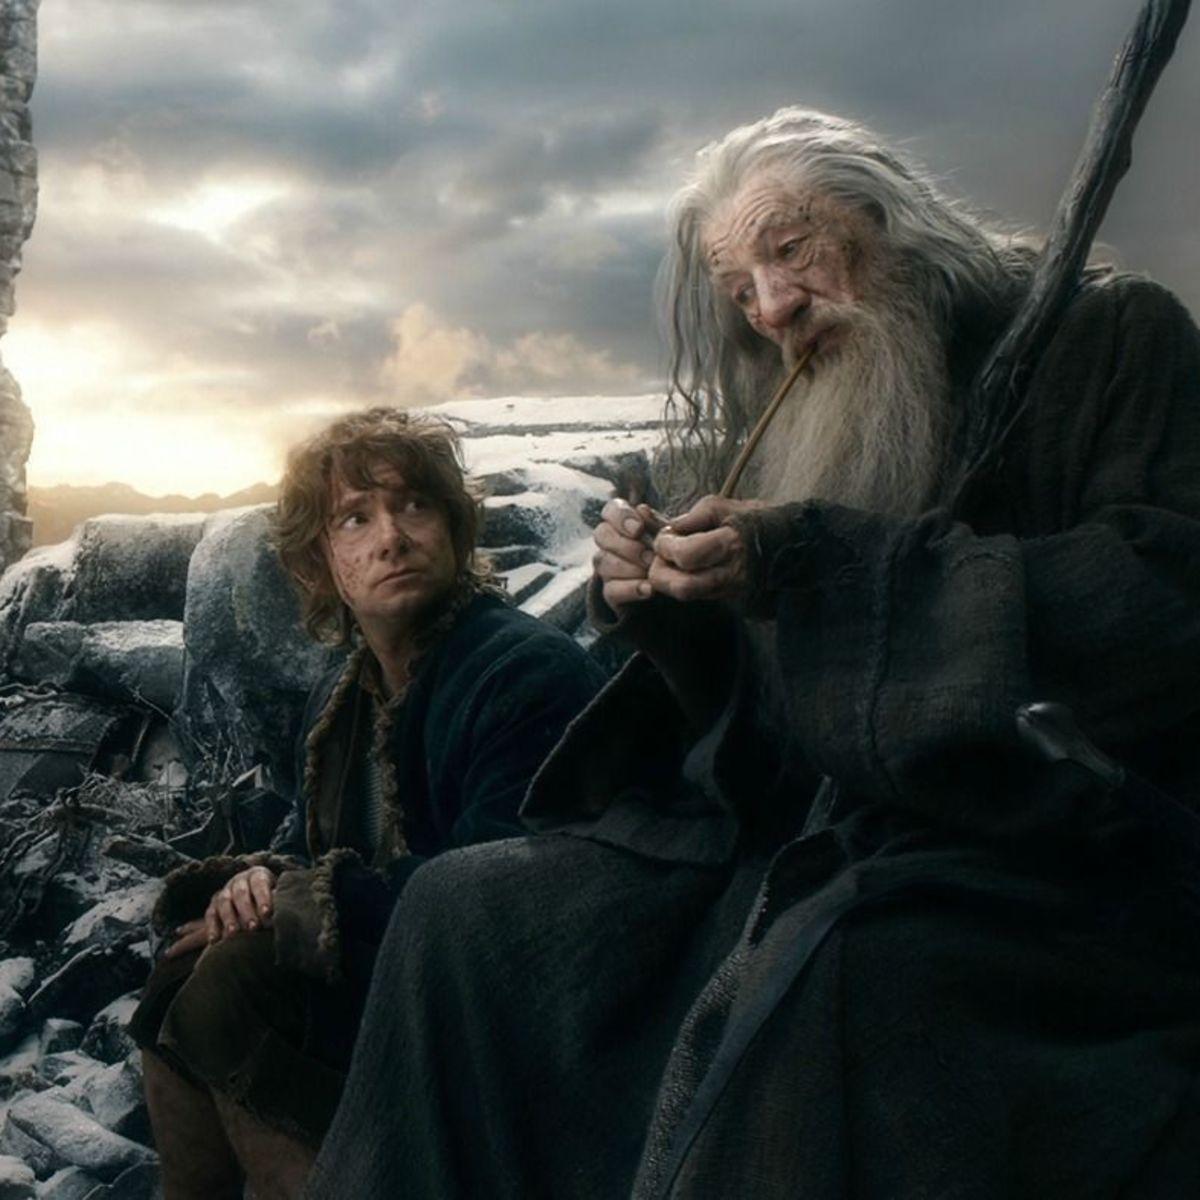 Hobbit_pipe_scene.JPG